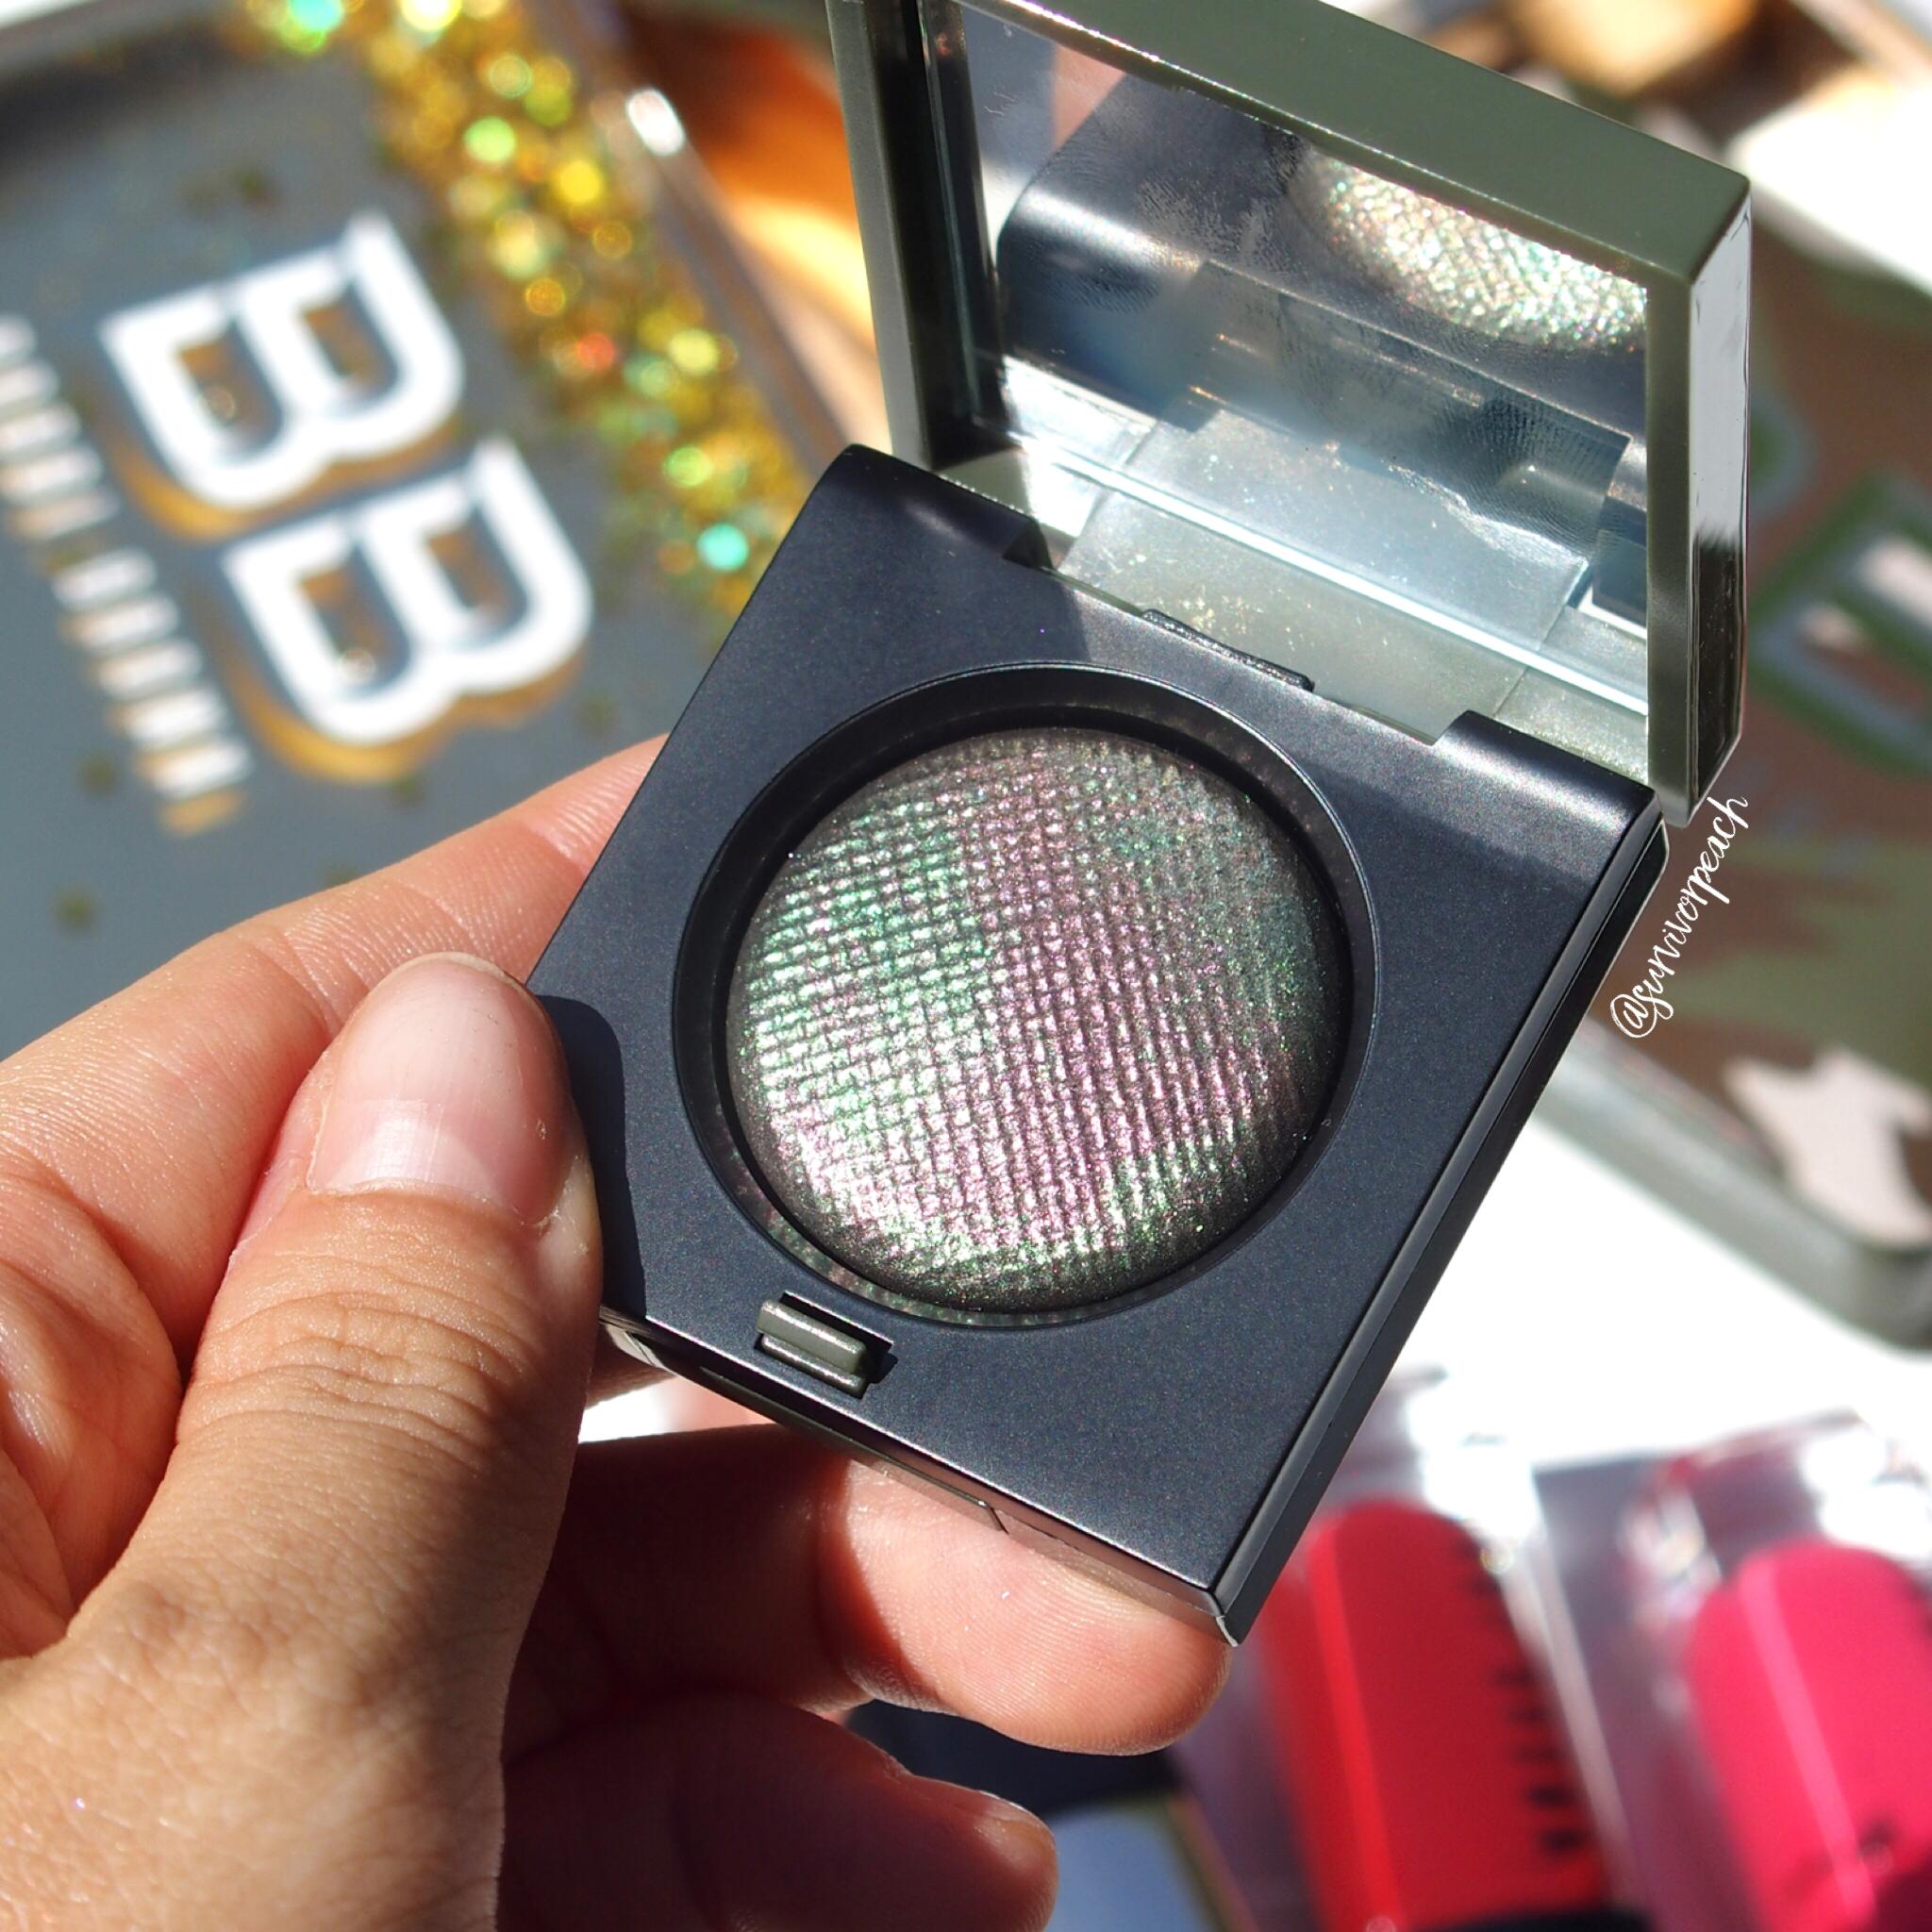 Bobbi Brown Camo Luxe eyeshadow in shade Jungle